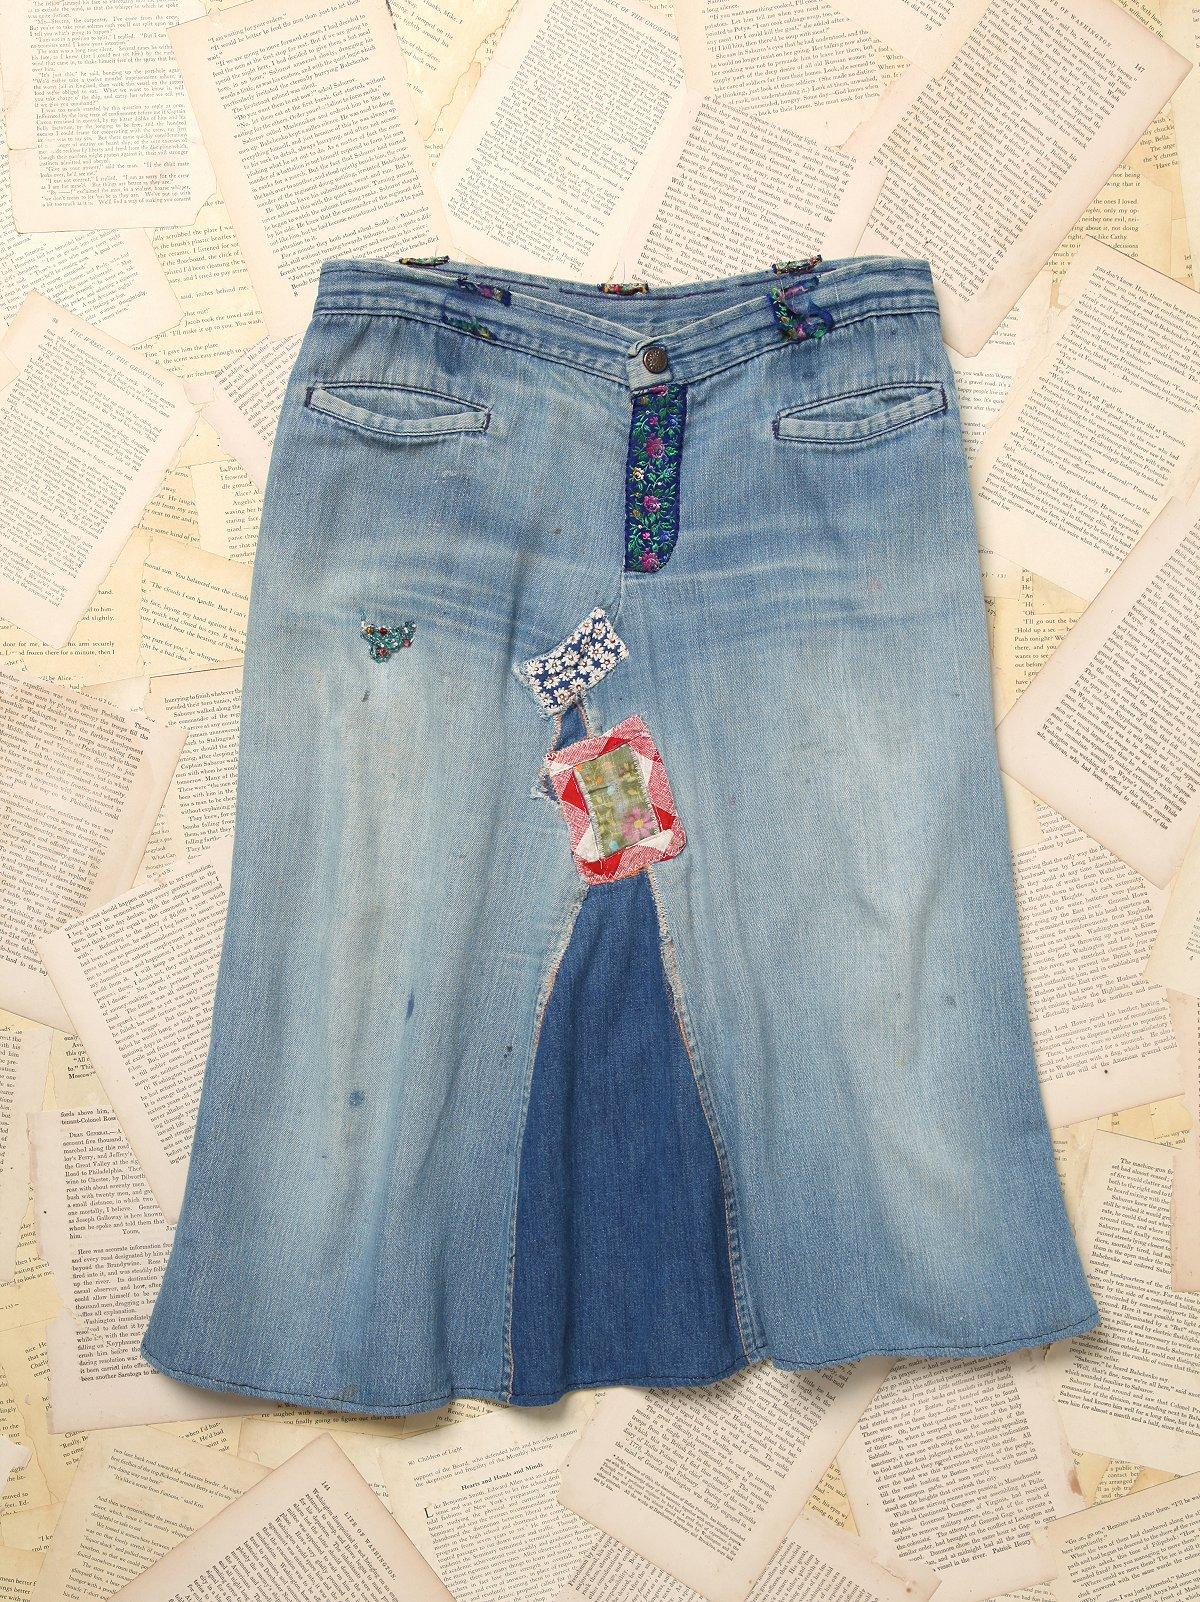 Vintage 3/4 Length Patchwork Denim Skirt